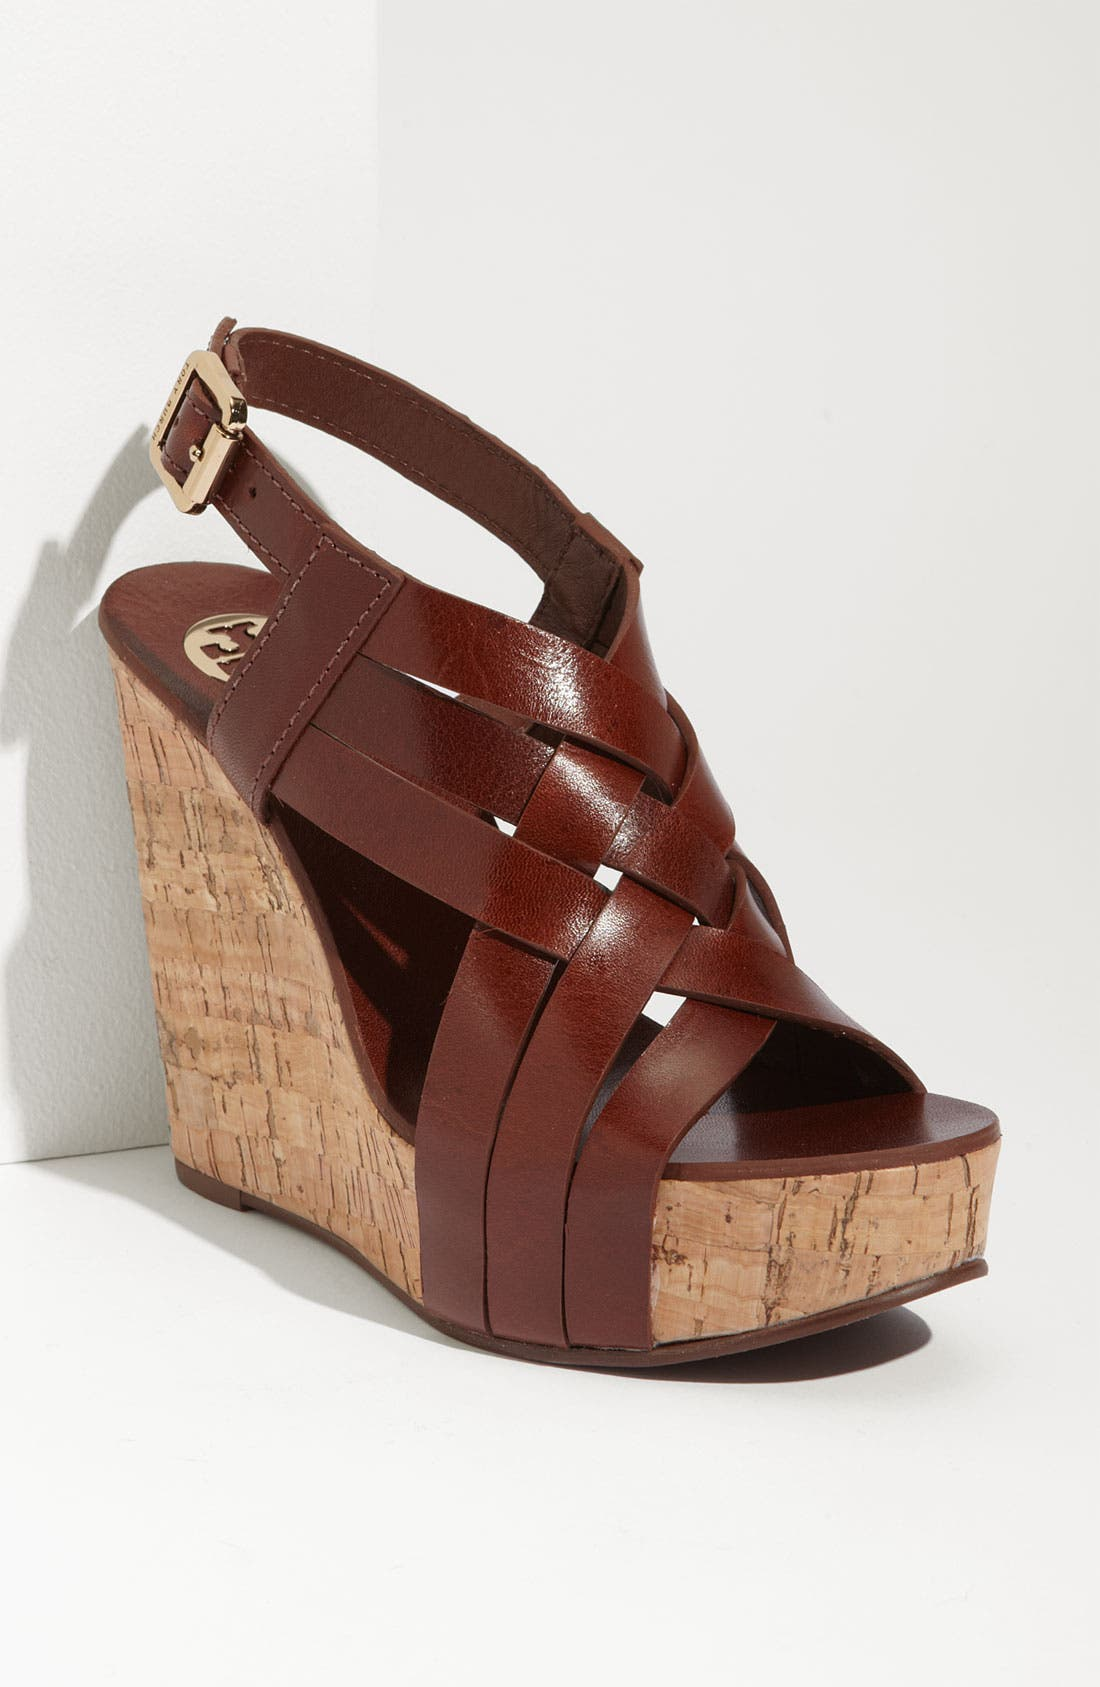 Main Image - Tory Burch 'Ace' Wedge Sandal